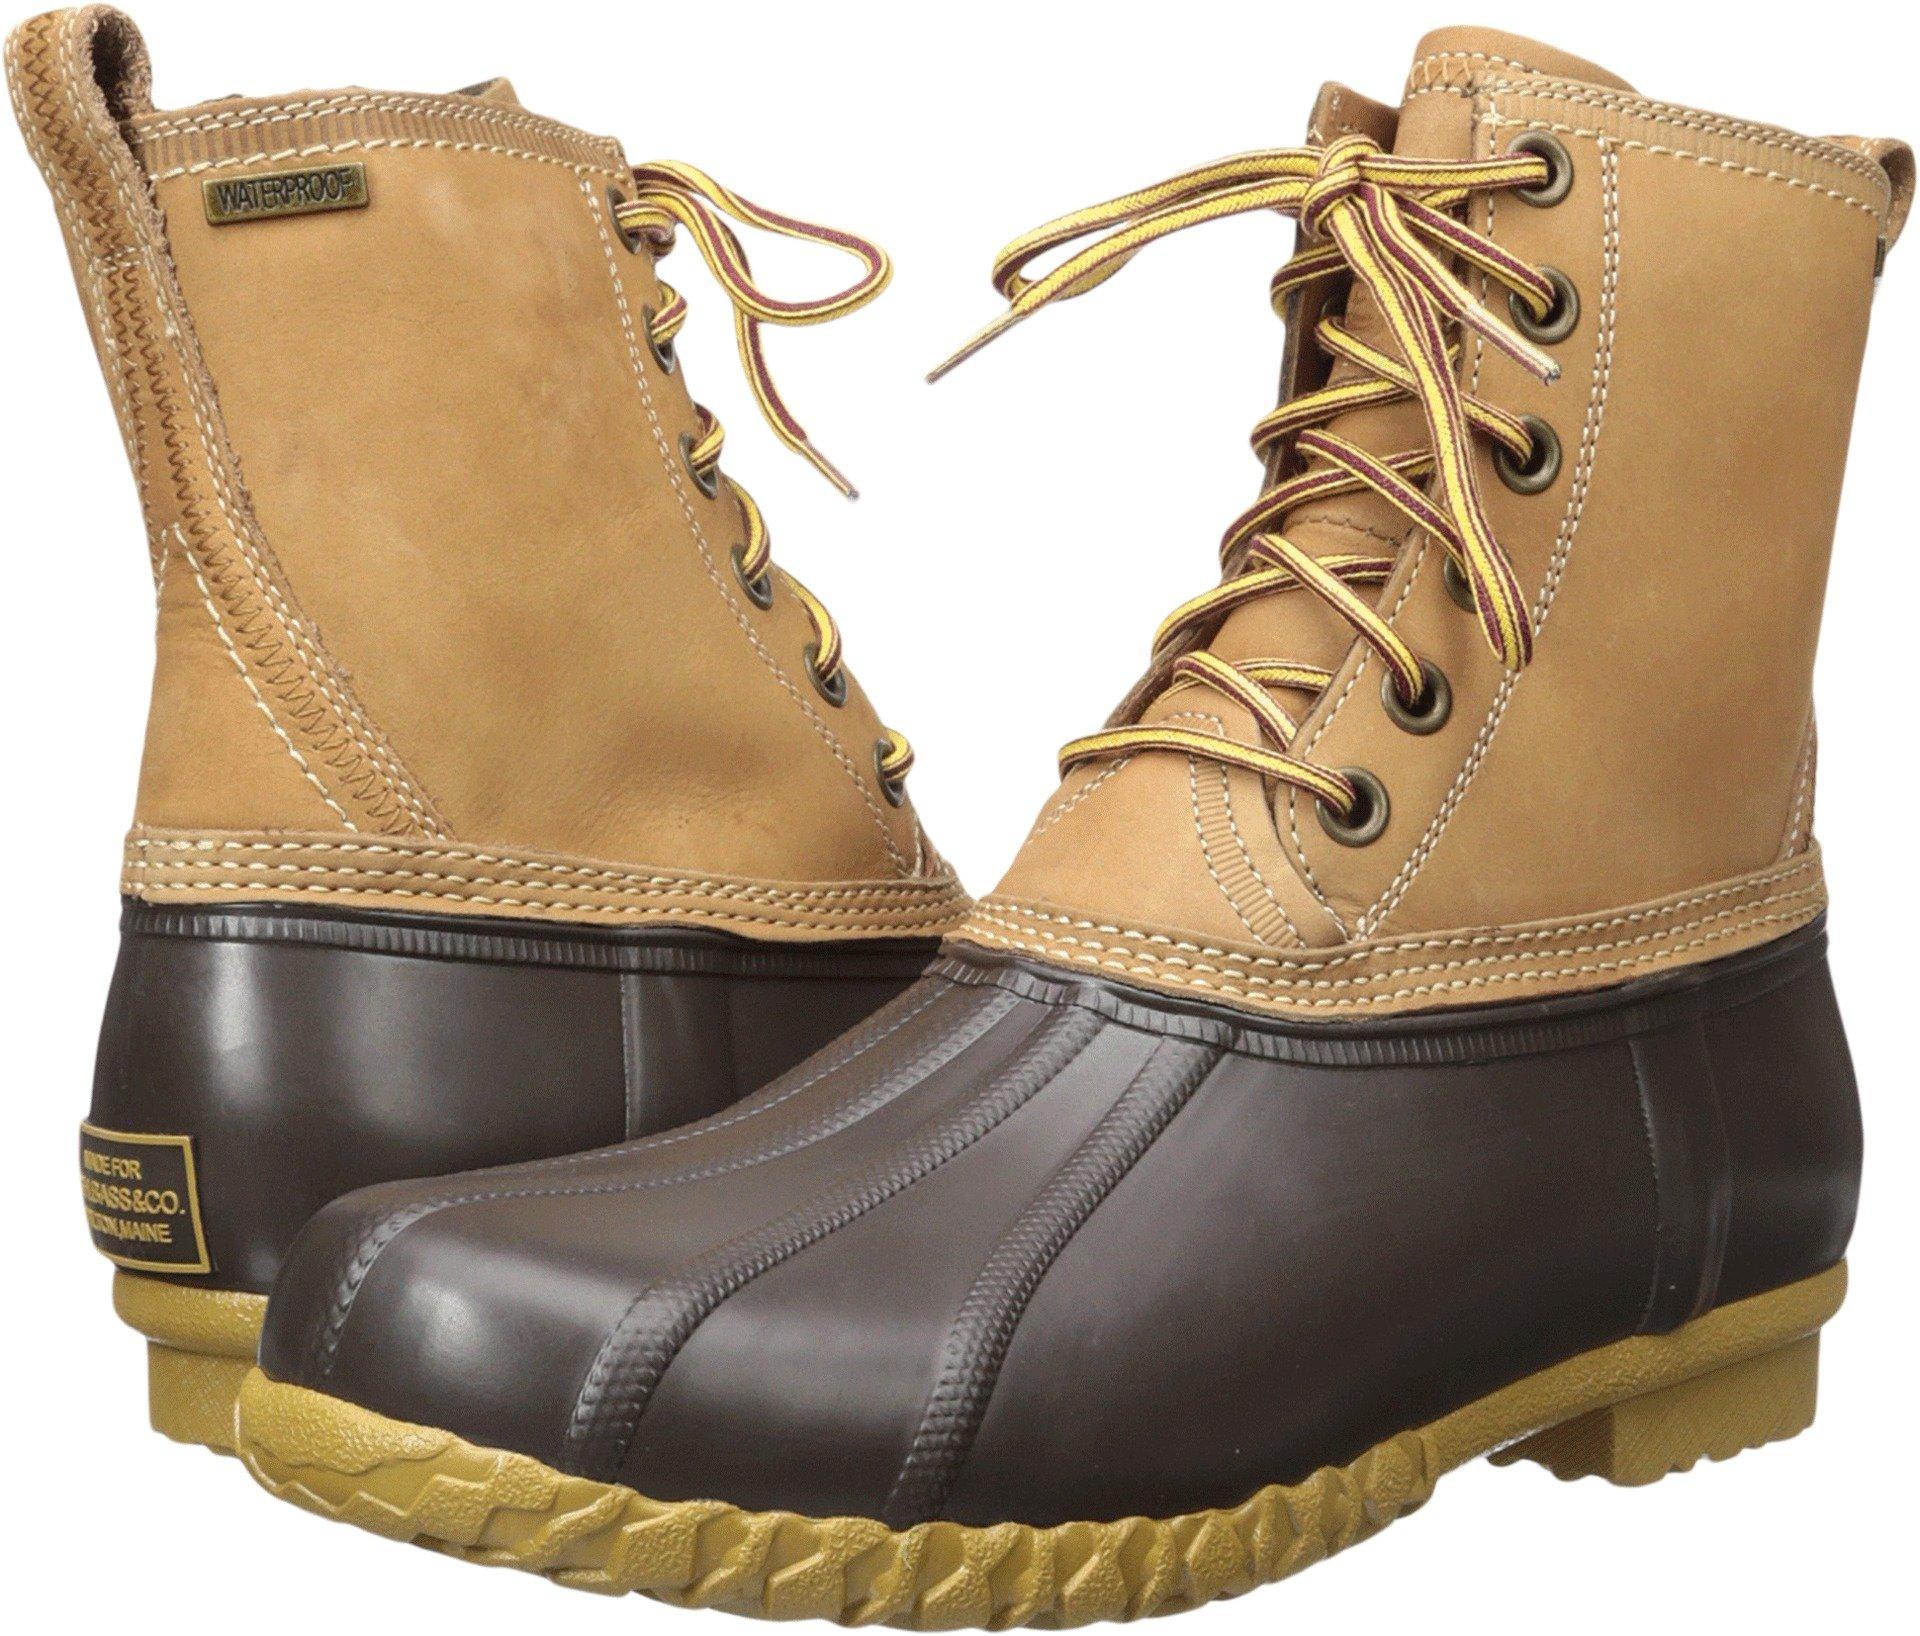 G.H. Bass & Co. Men's Dixon Rain Boot, Dark Tan/Brown, 7 M US by G.H. Bass & Co.